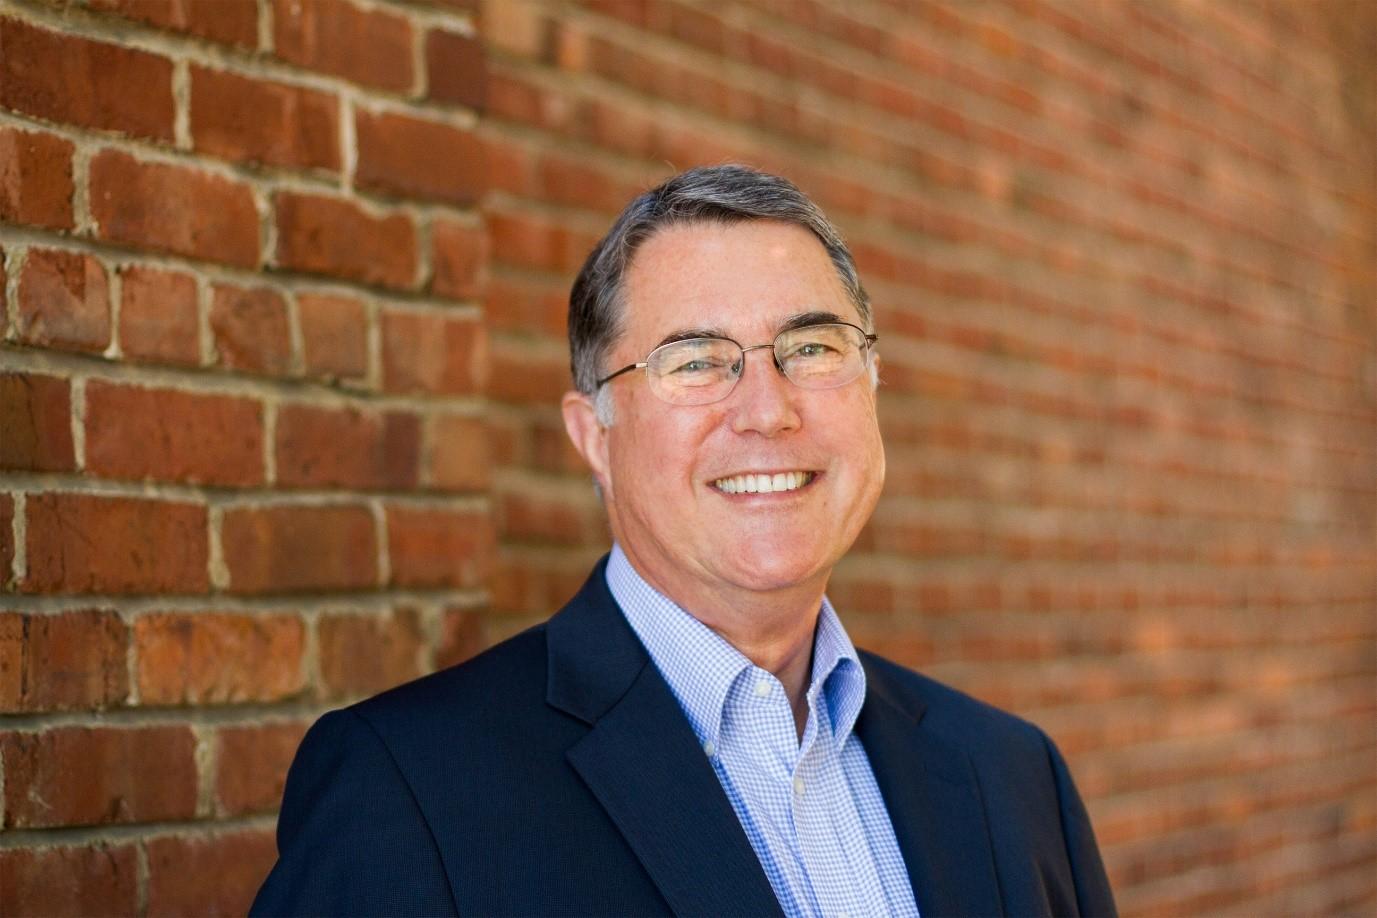 Richard Stephenson